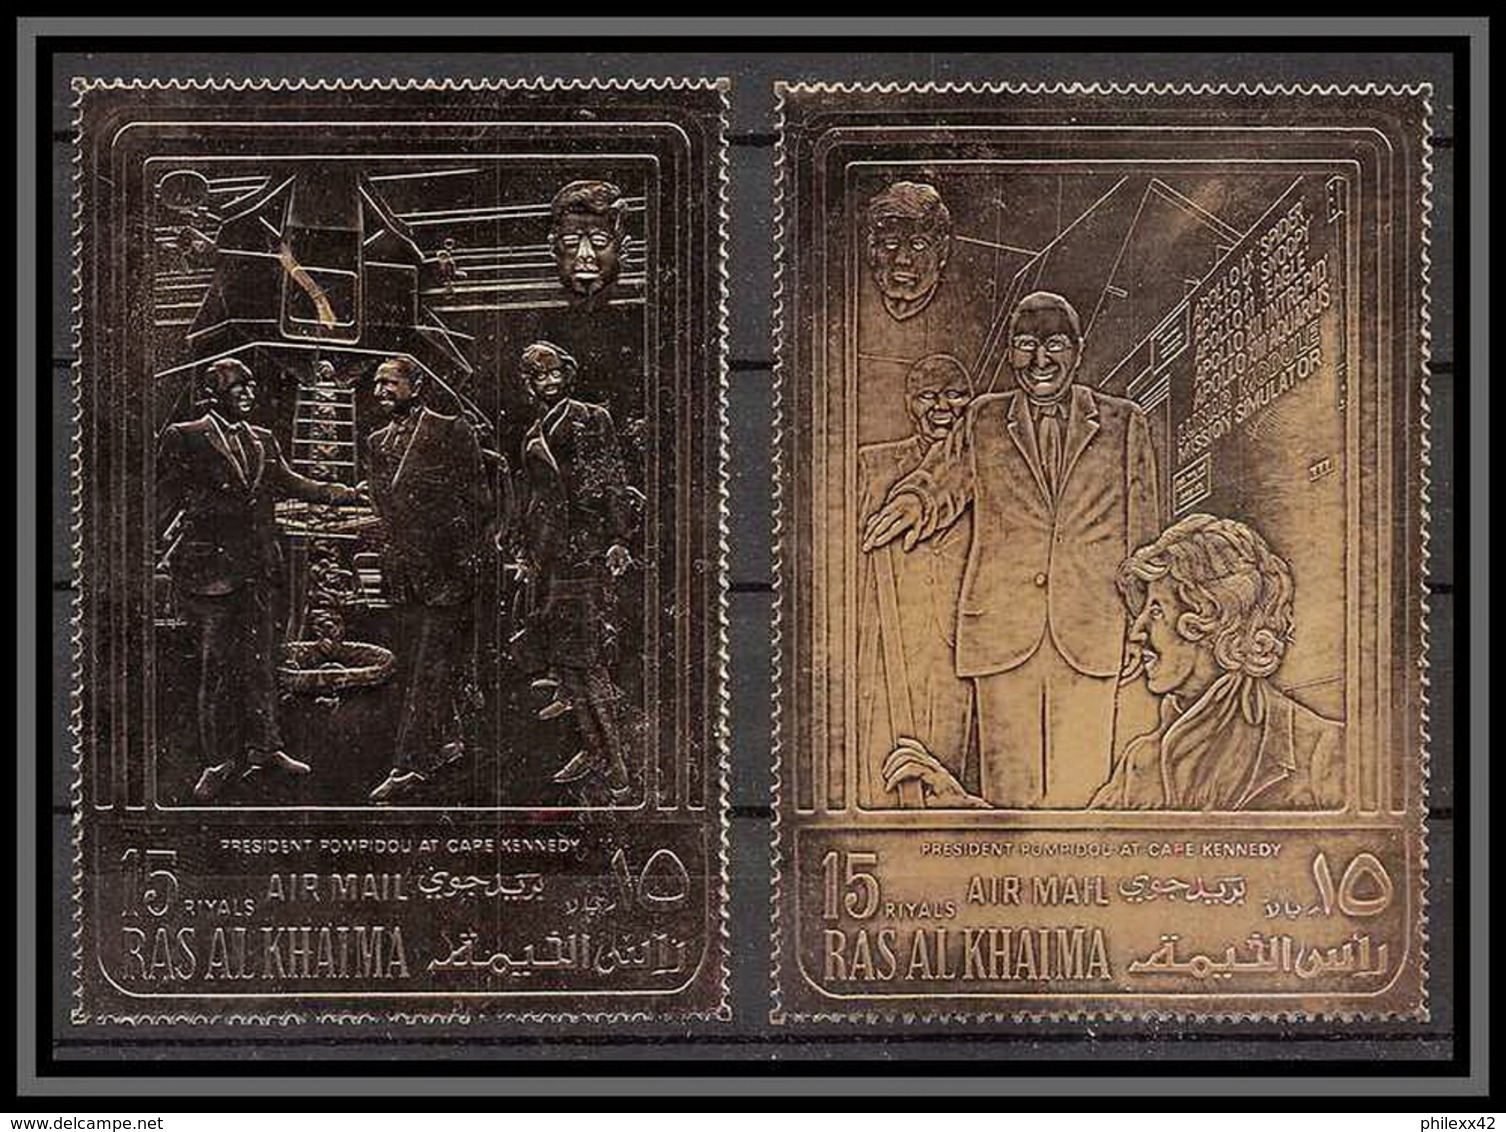 Ras Al Khaima - 718/ N°770 / 779 A Pompidou Usa Kennedy Espace Space Apollo Timbres OR Gold Stamps Cachet Rouge - Ras Al-Khaima